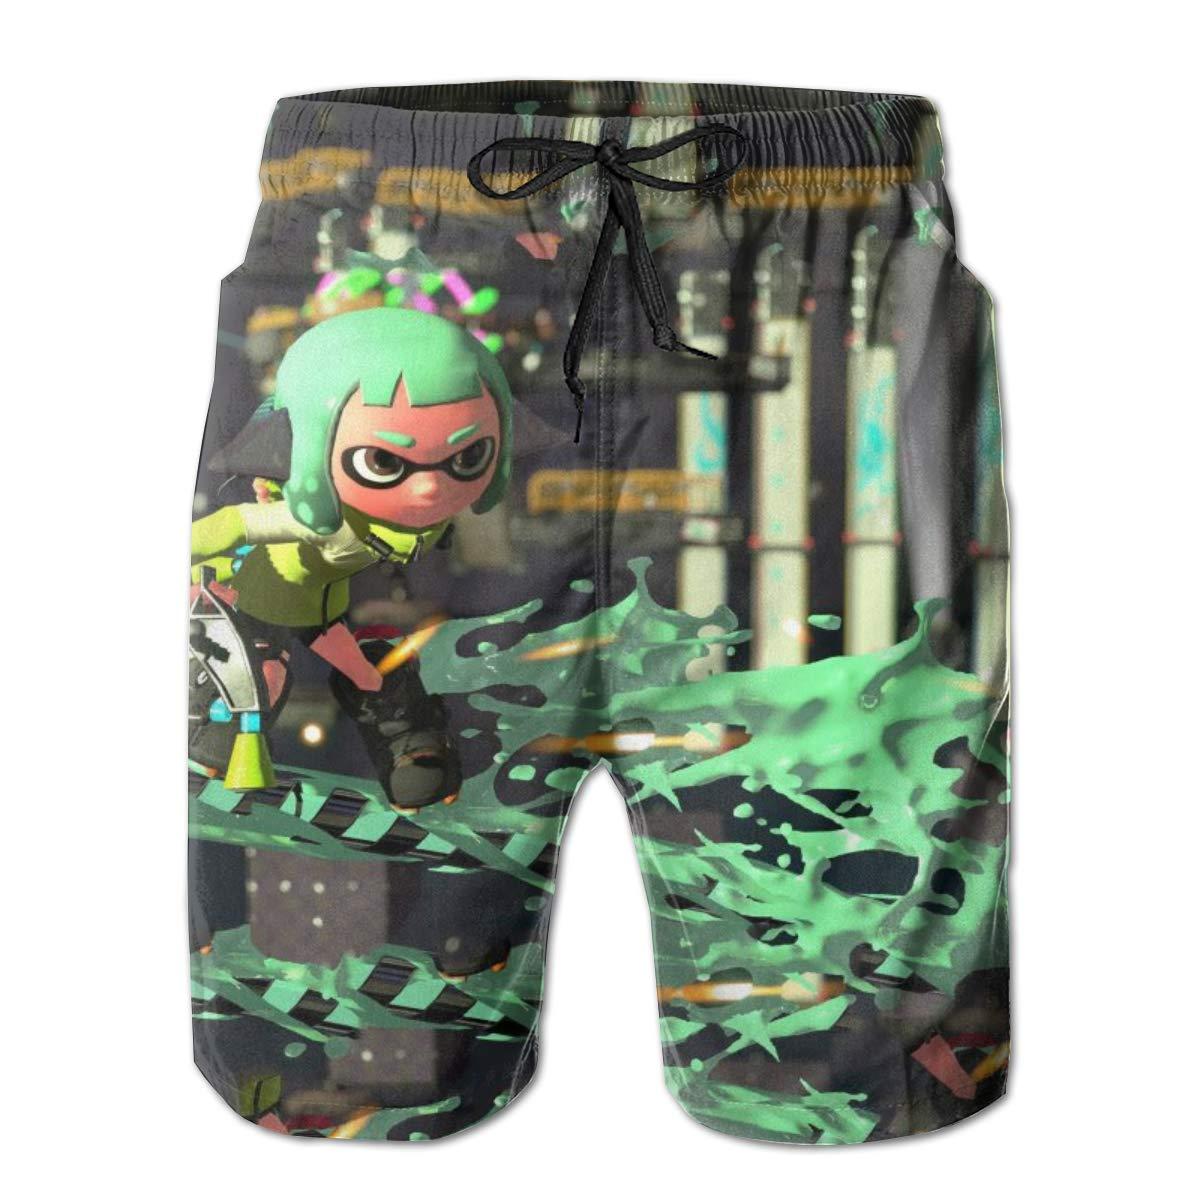 8Lucky Mens Swimming Trunks Quick Dry Beach Board Shorts Mesh Lining Splatoon-2 Printed Summer Casual Drawstring Pants